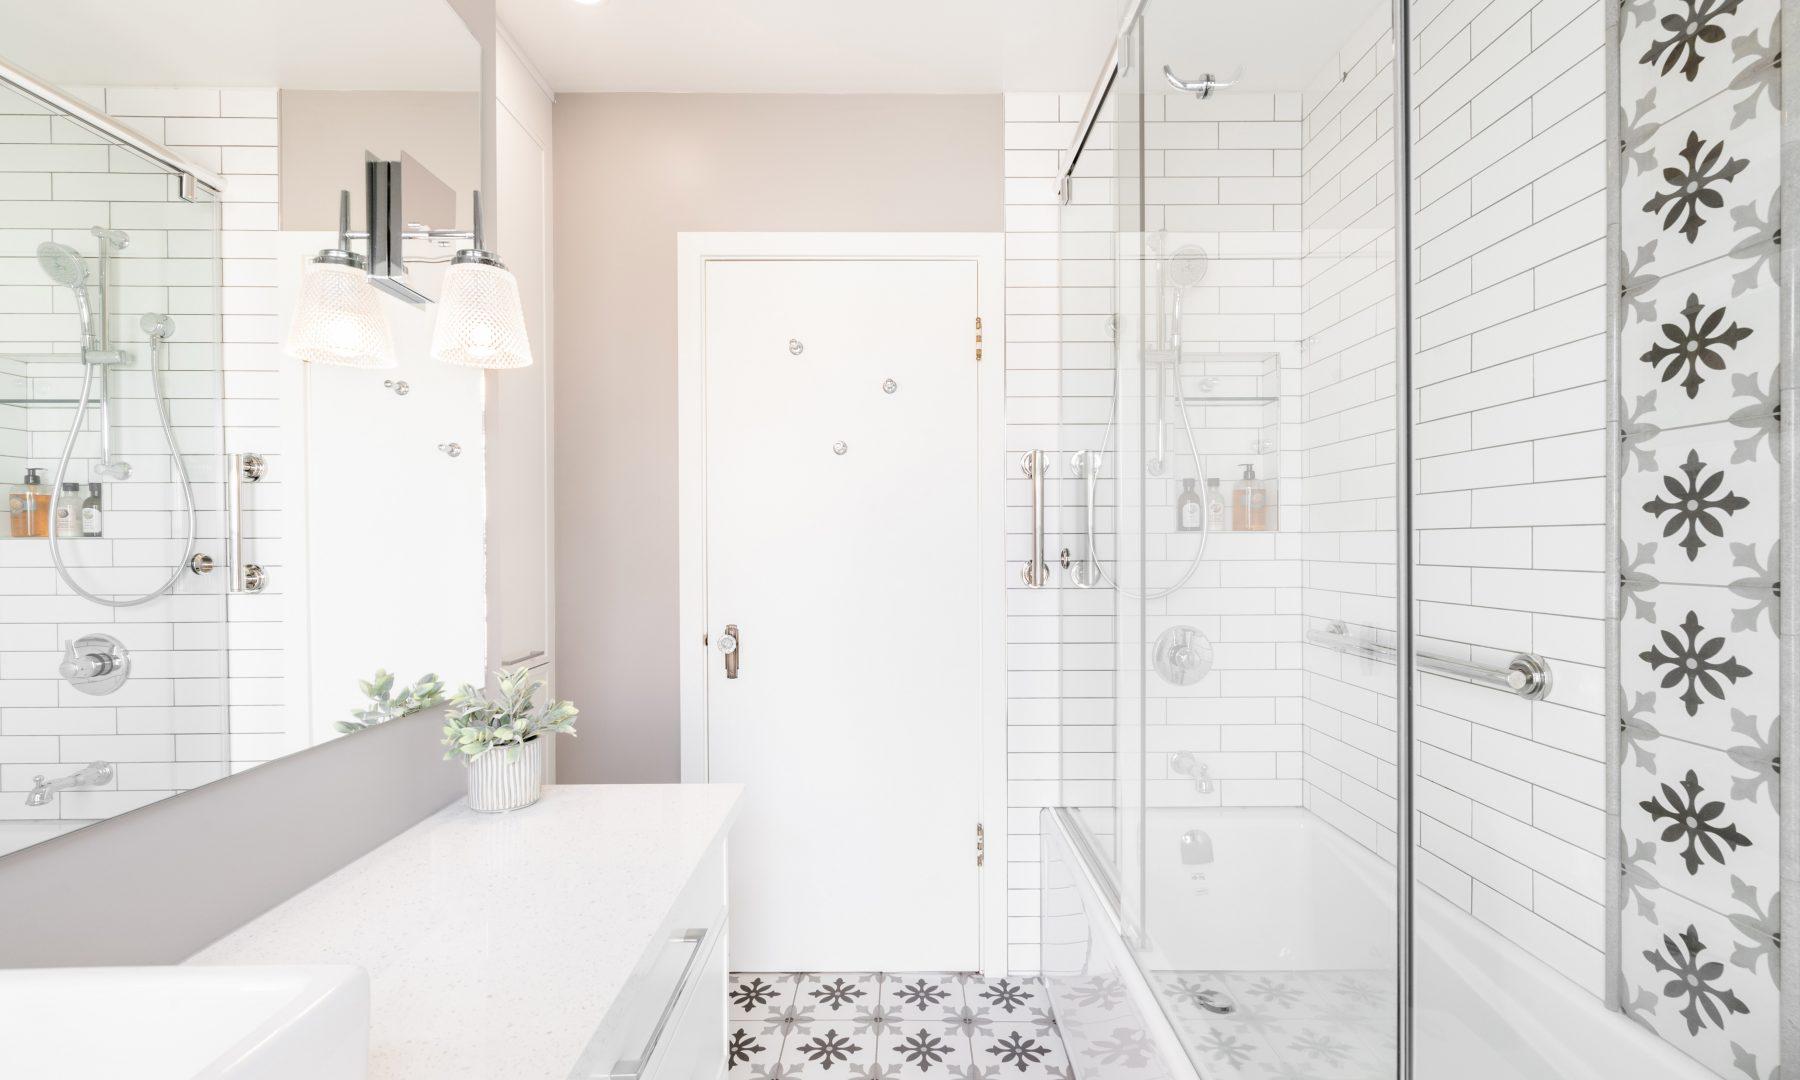 Cabico Custom Cabinets - Projet salle de bain Cedar Hill - vue avec la douche